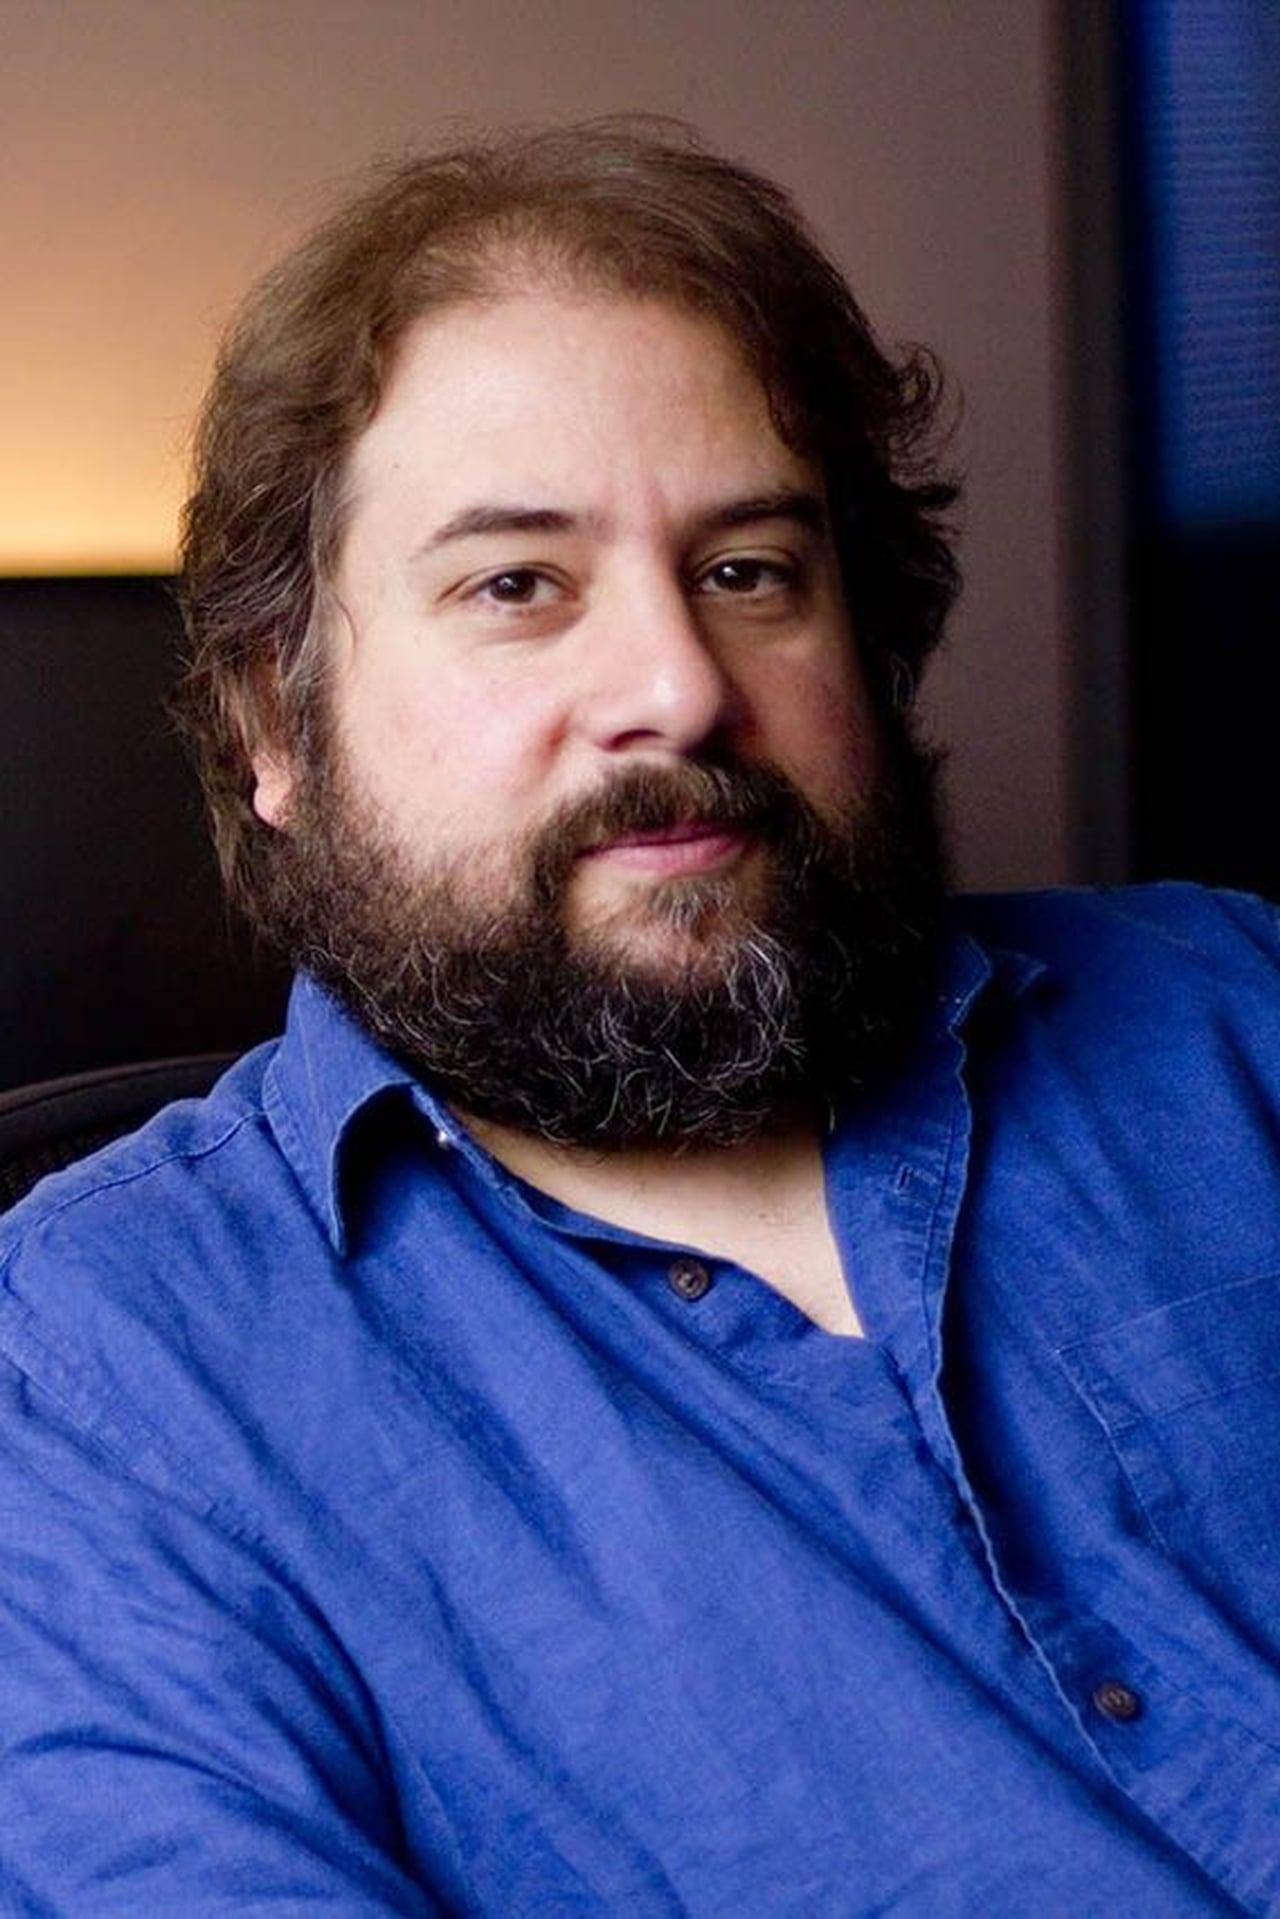 Paul Machliss